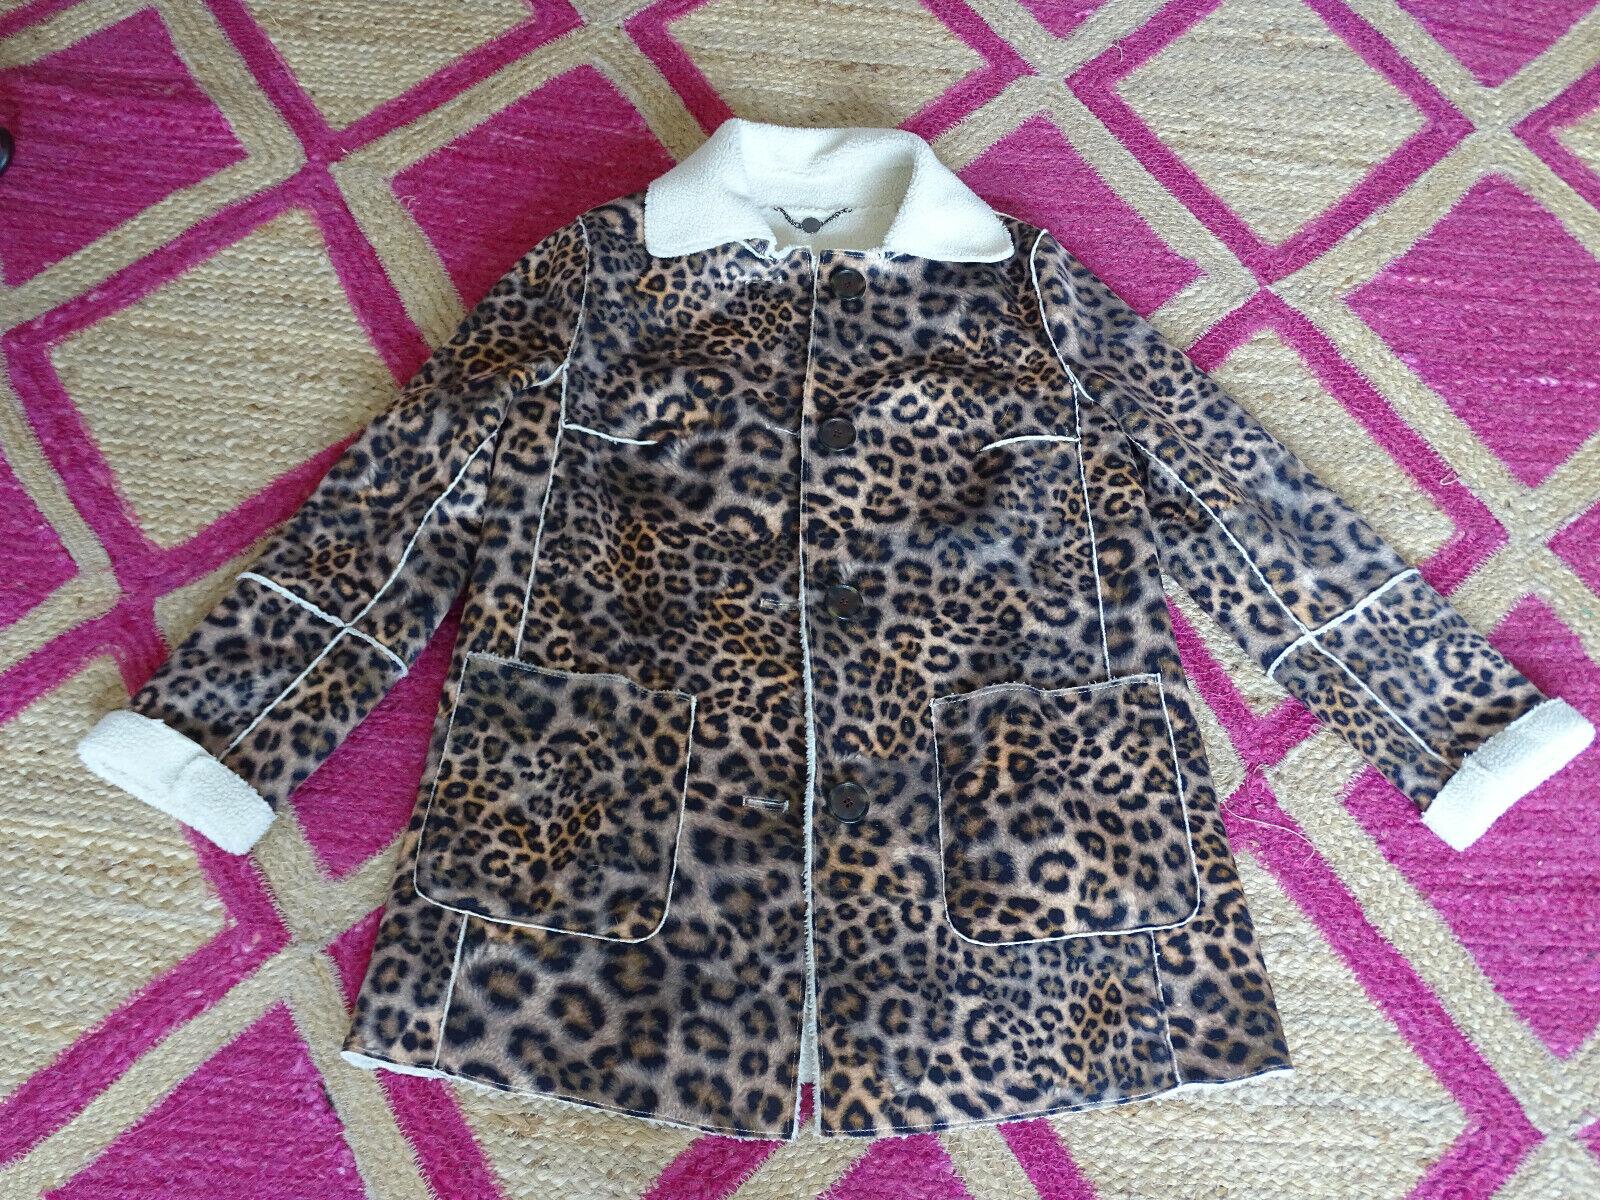 Marc Cain Jacke N1 animal print leopard ndnlji1529 neue